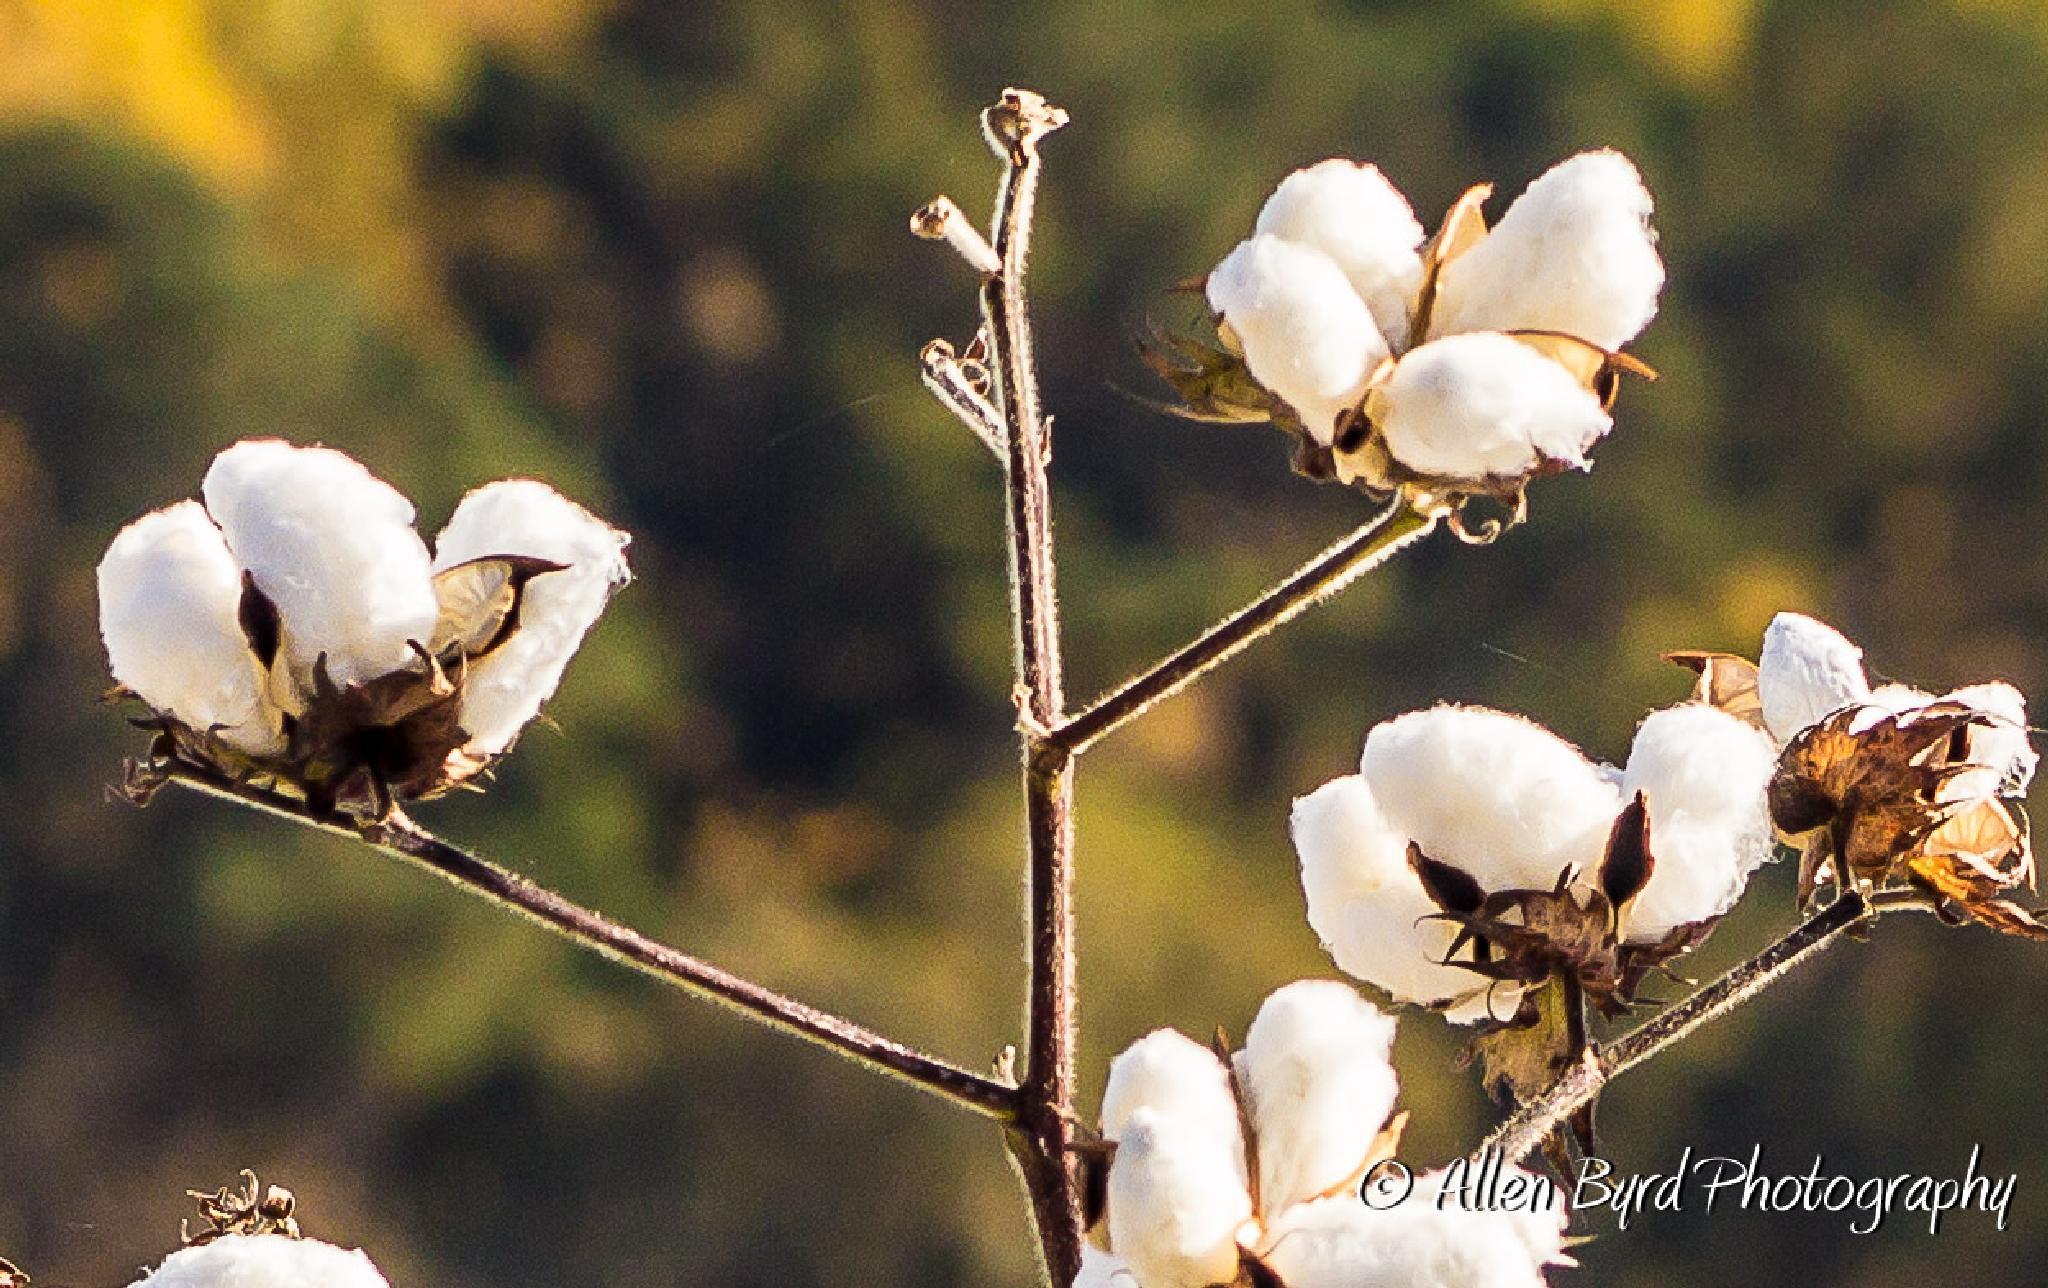 North Carolina Cotton Field by Allen Byrd Photography